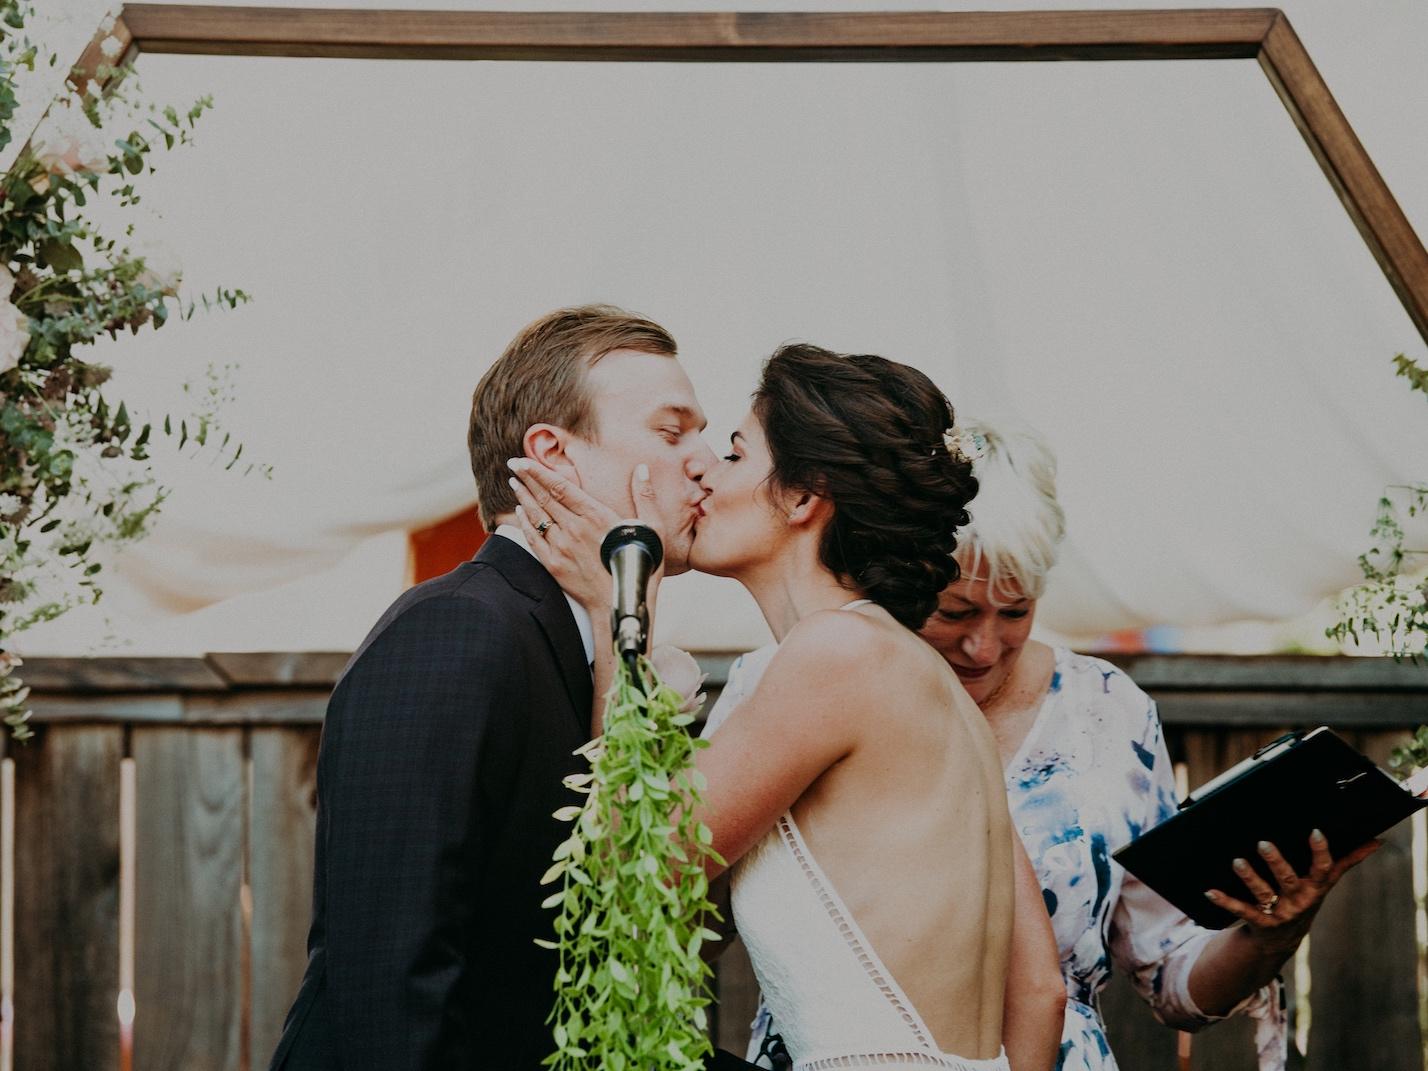 Oklahoma+City+Wedding+Photographer+Package101.jpg